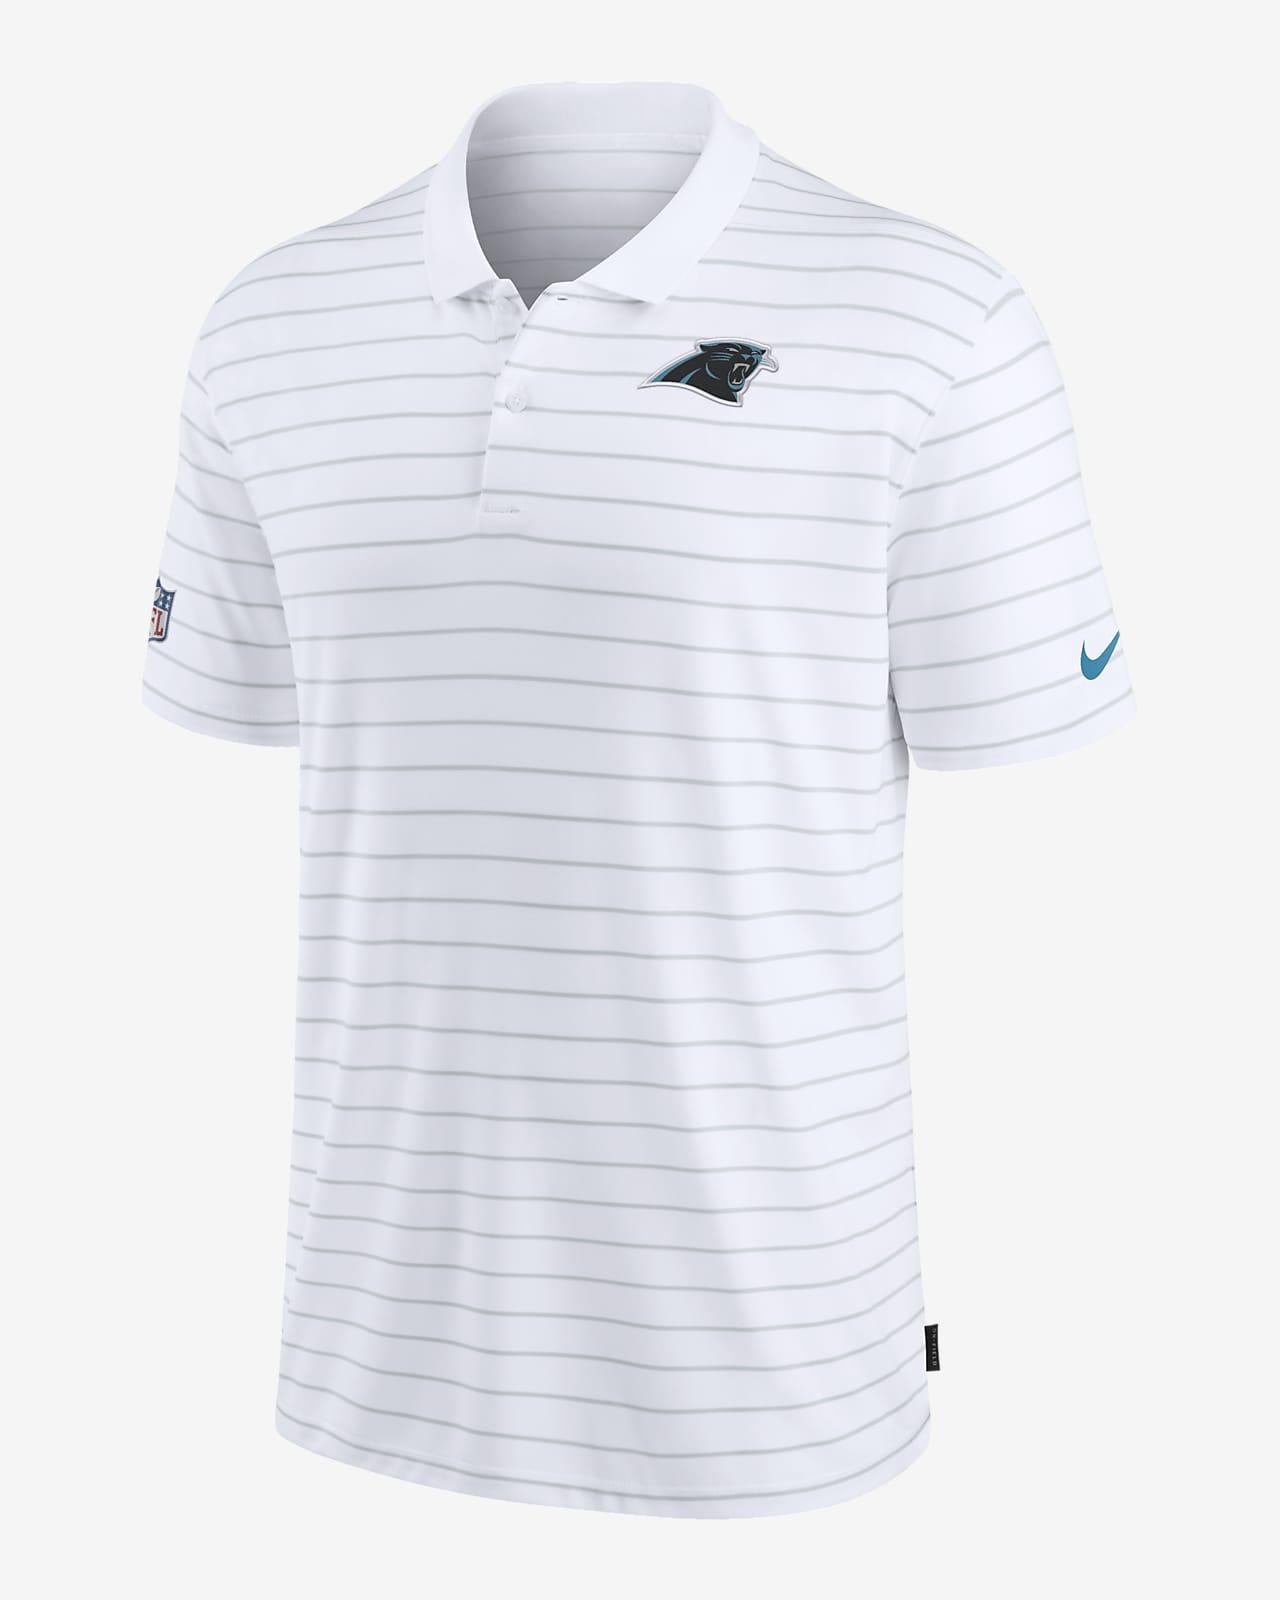 Nike Dri-FIT Sideline Victory Coaches (NFL Carolina Panthers) Men's Polo